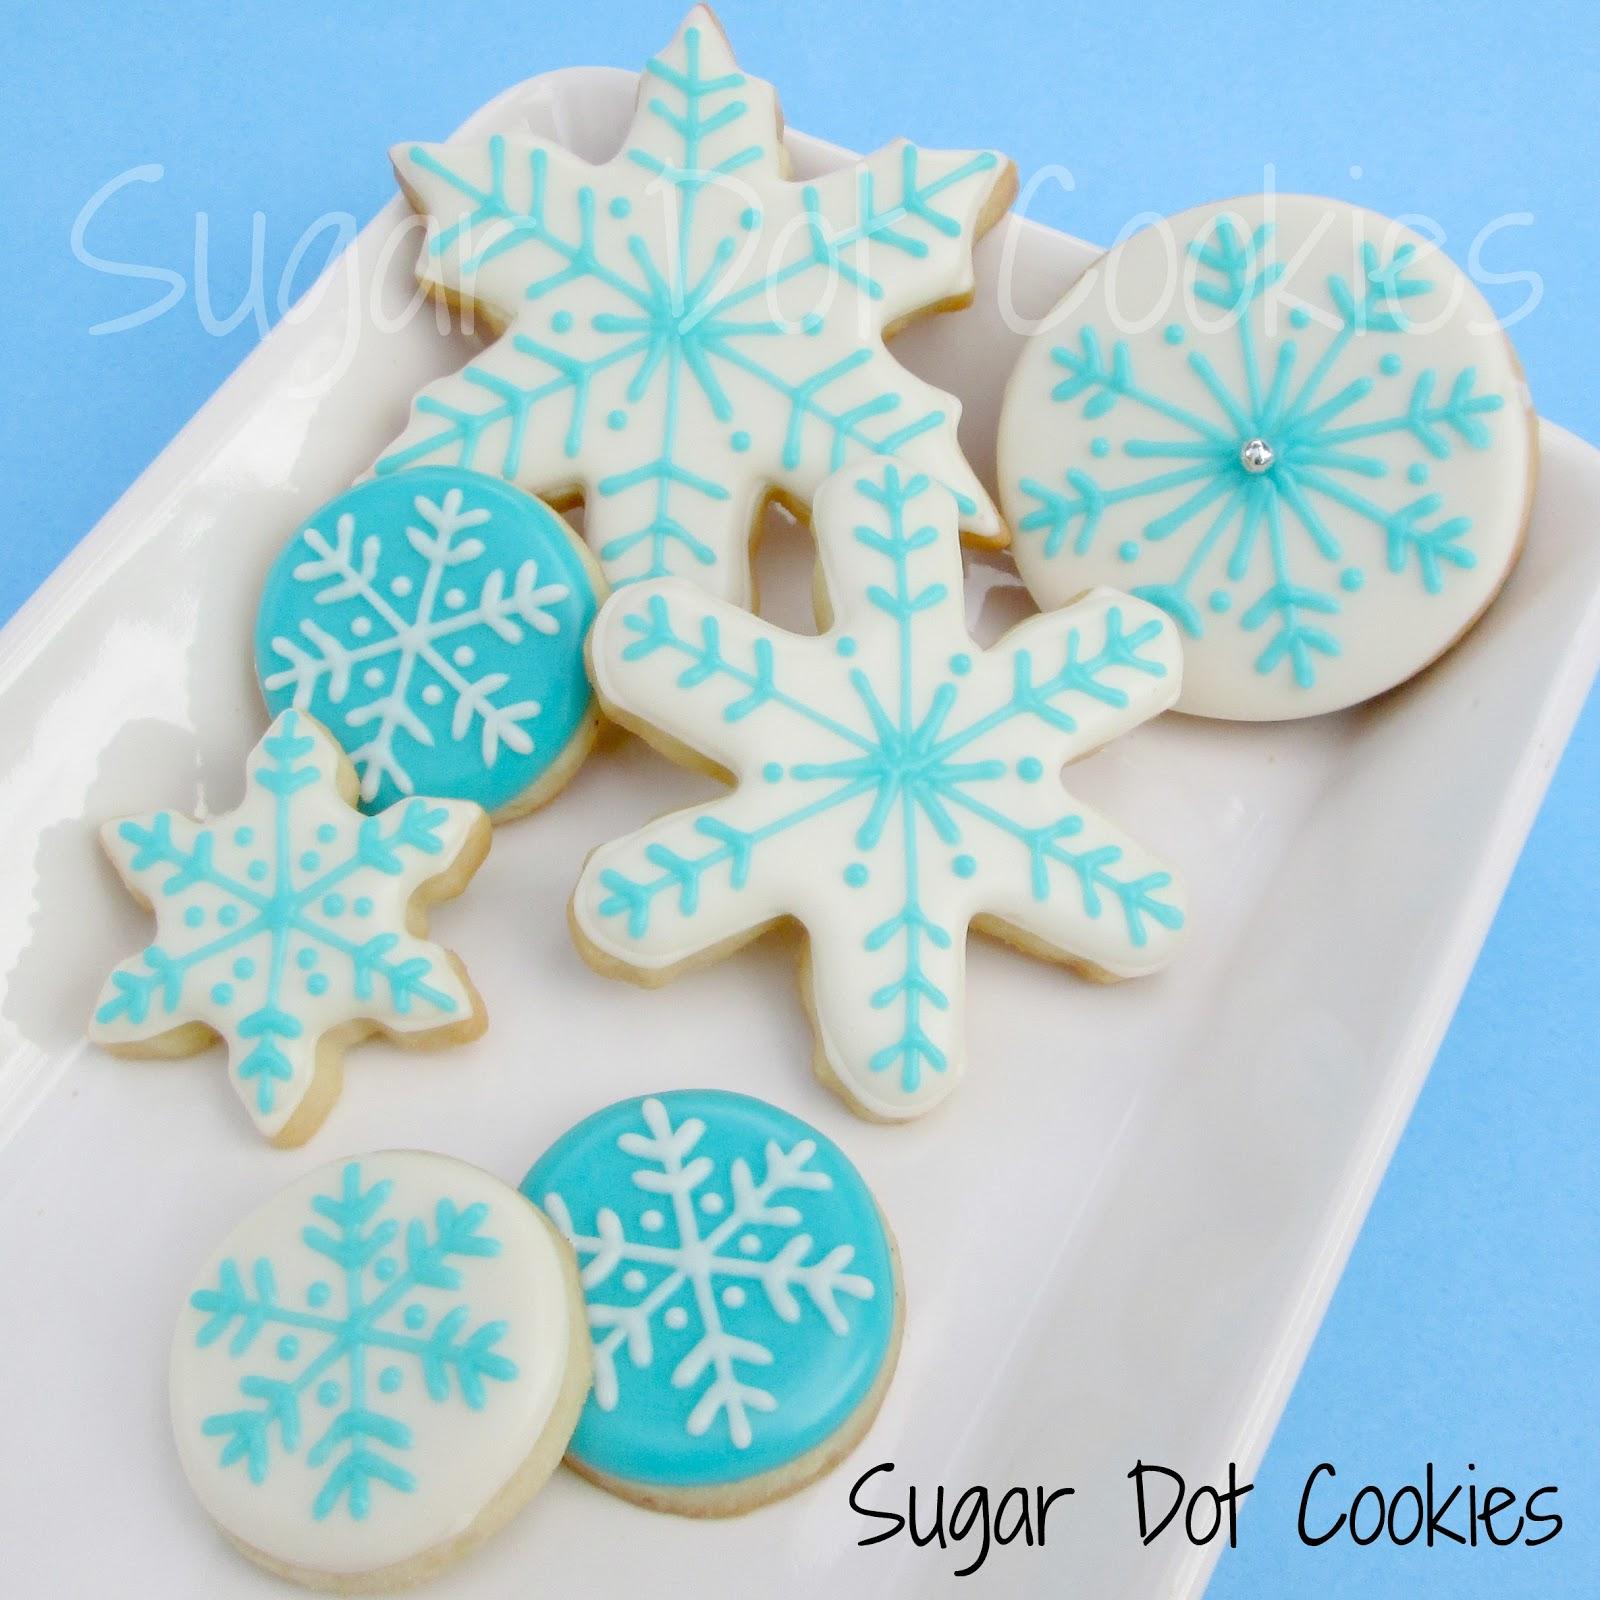 Christmas sugar cookie decorating ideas - Cutoutsugar Cookies8